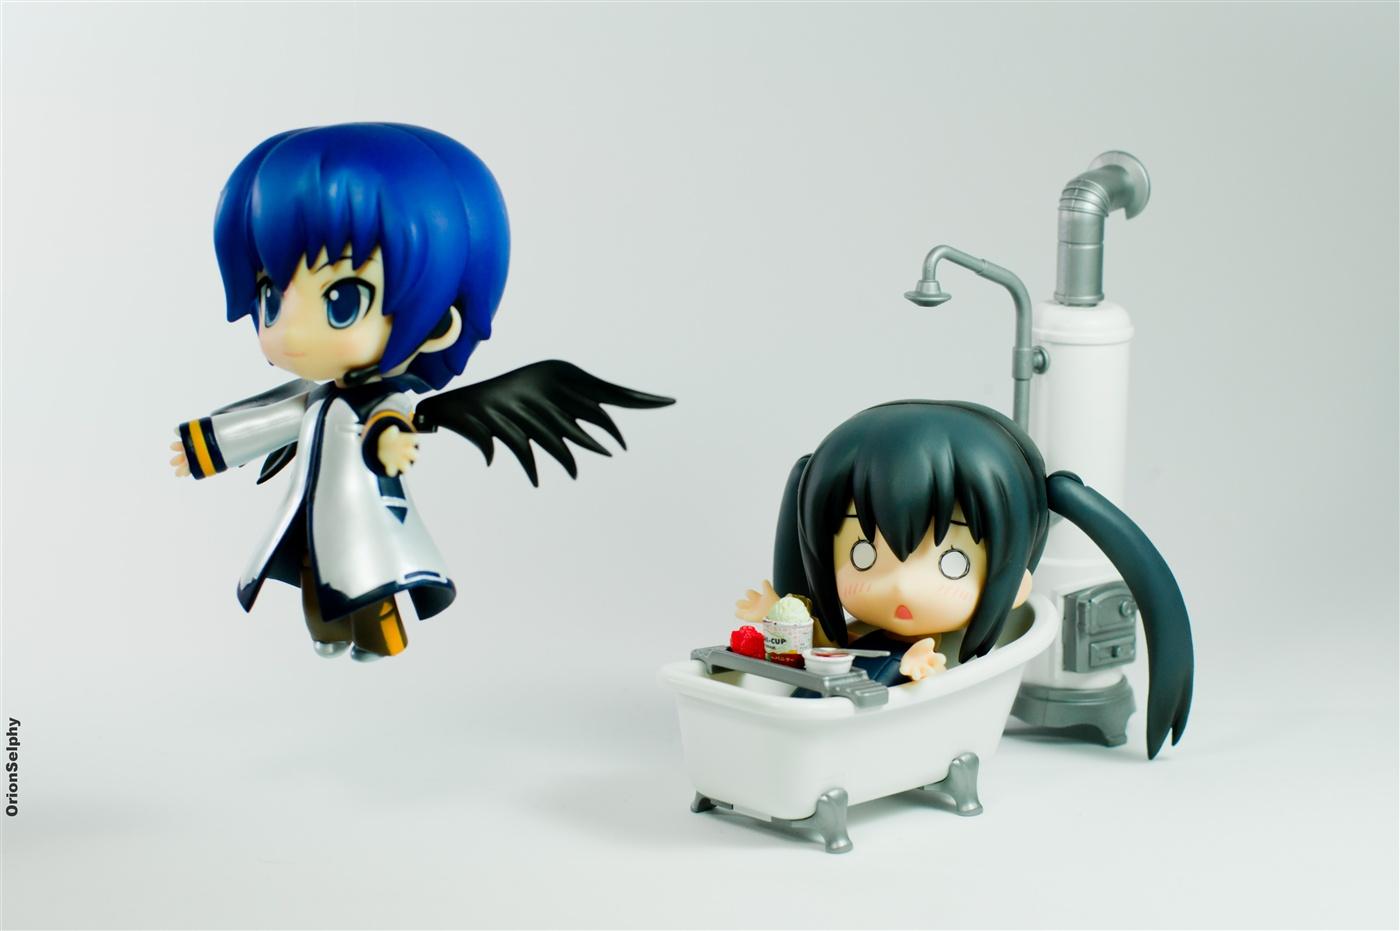 vocaloid angel nendoroid saint toy kaito ryuk fly death nakano_azusa sony jfigure lightroom yoshica bikeh